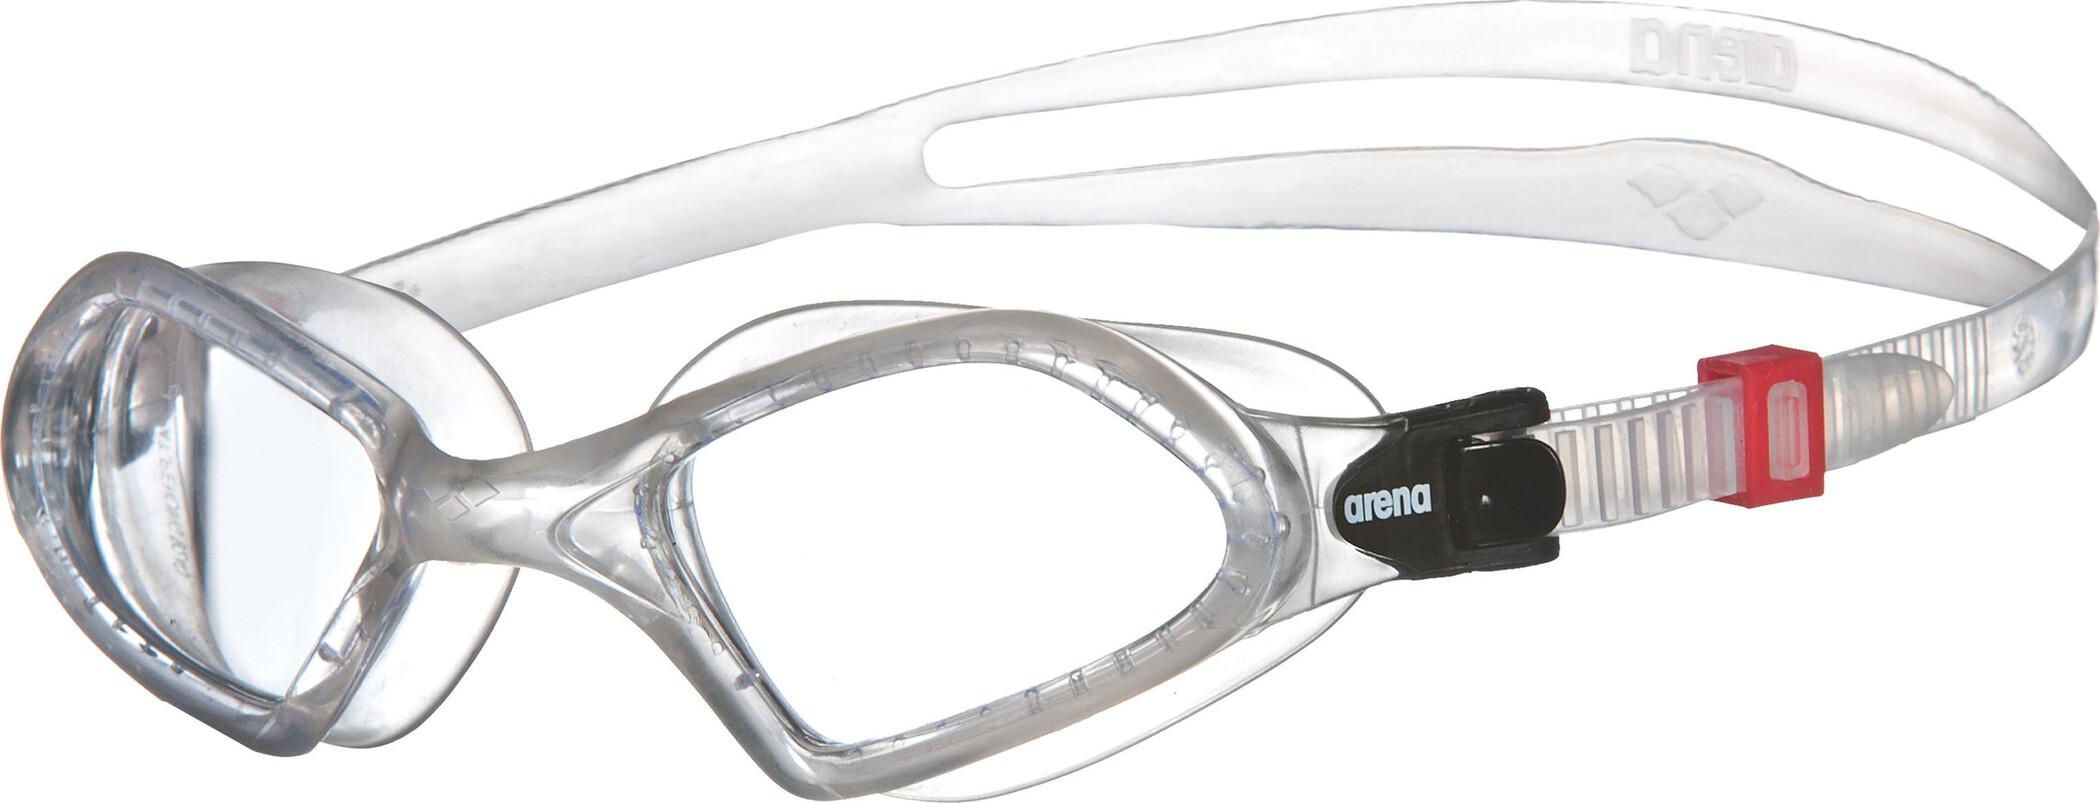 arena Smartfit Svømmebriller, clear-clear-clear   Swim equipment